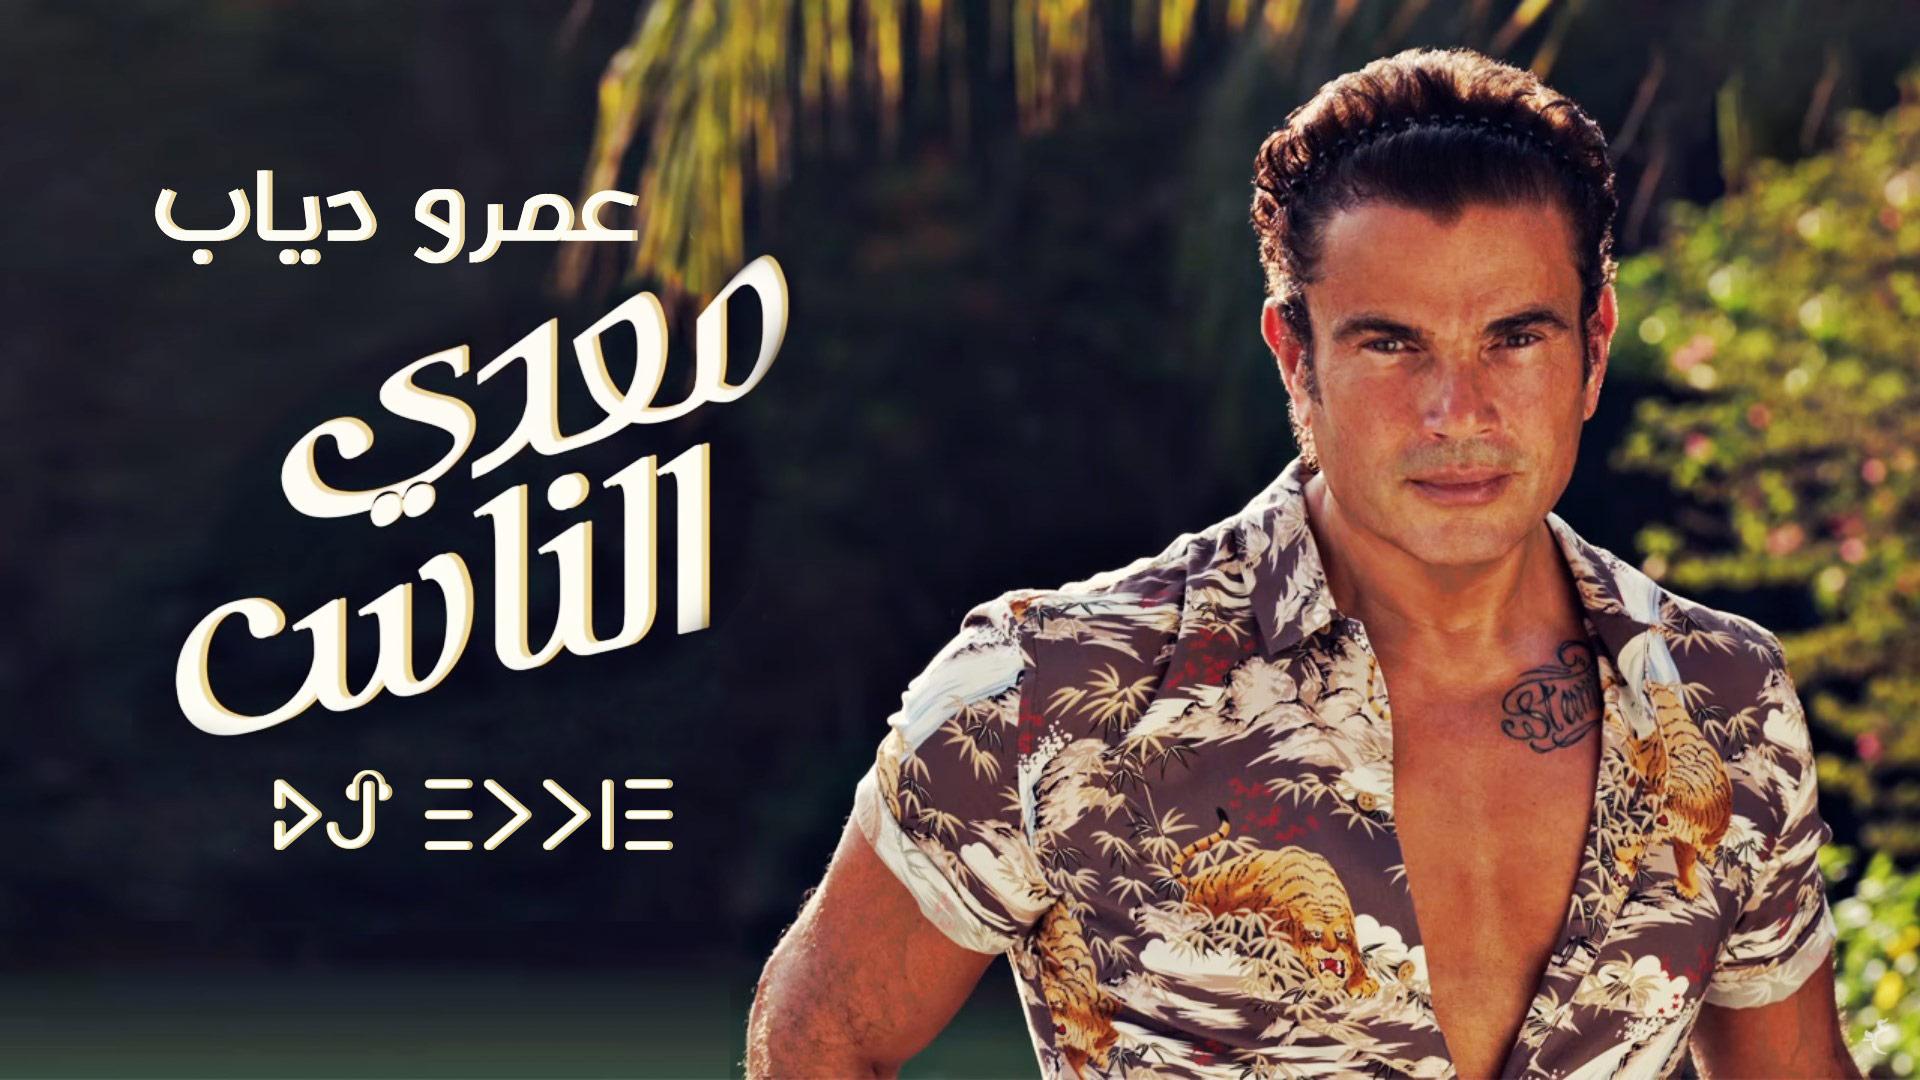 عمرو دياب - معدي الناس Amr Diab - Meaddy El Nas